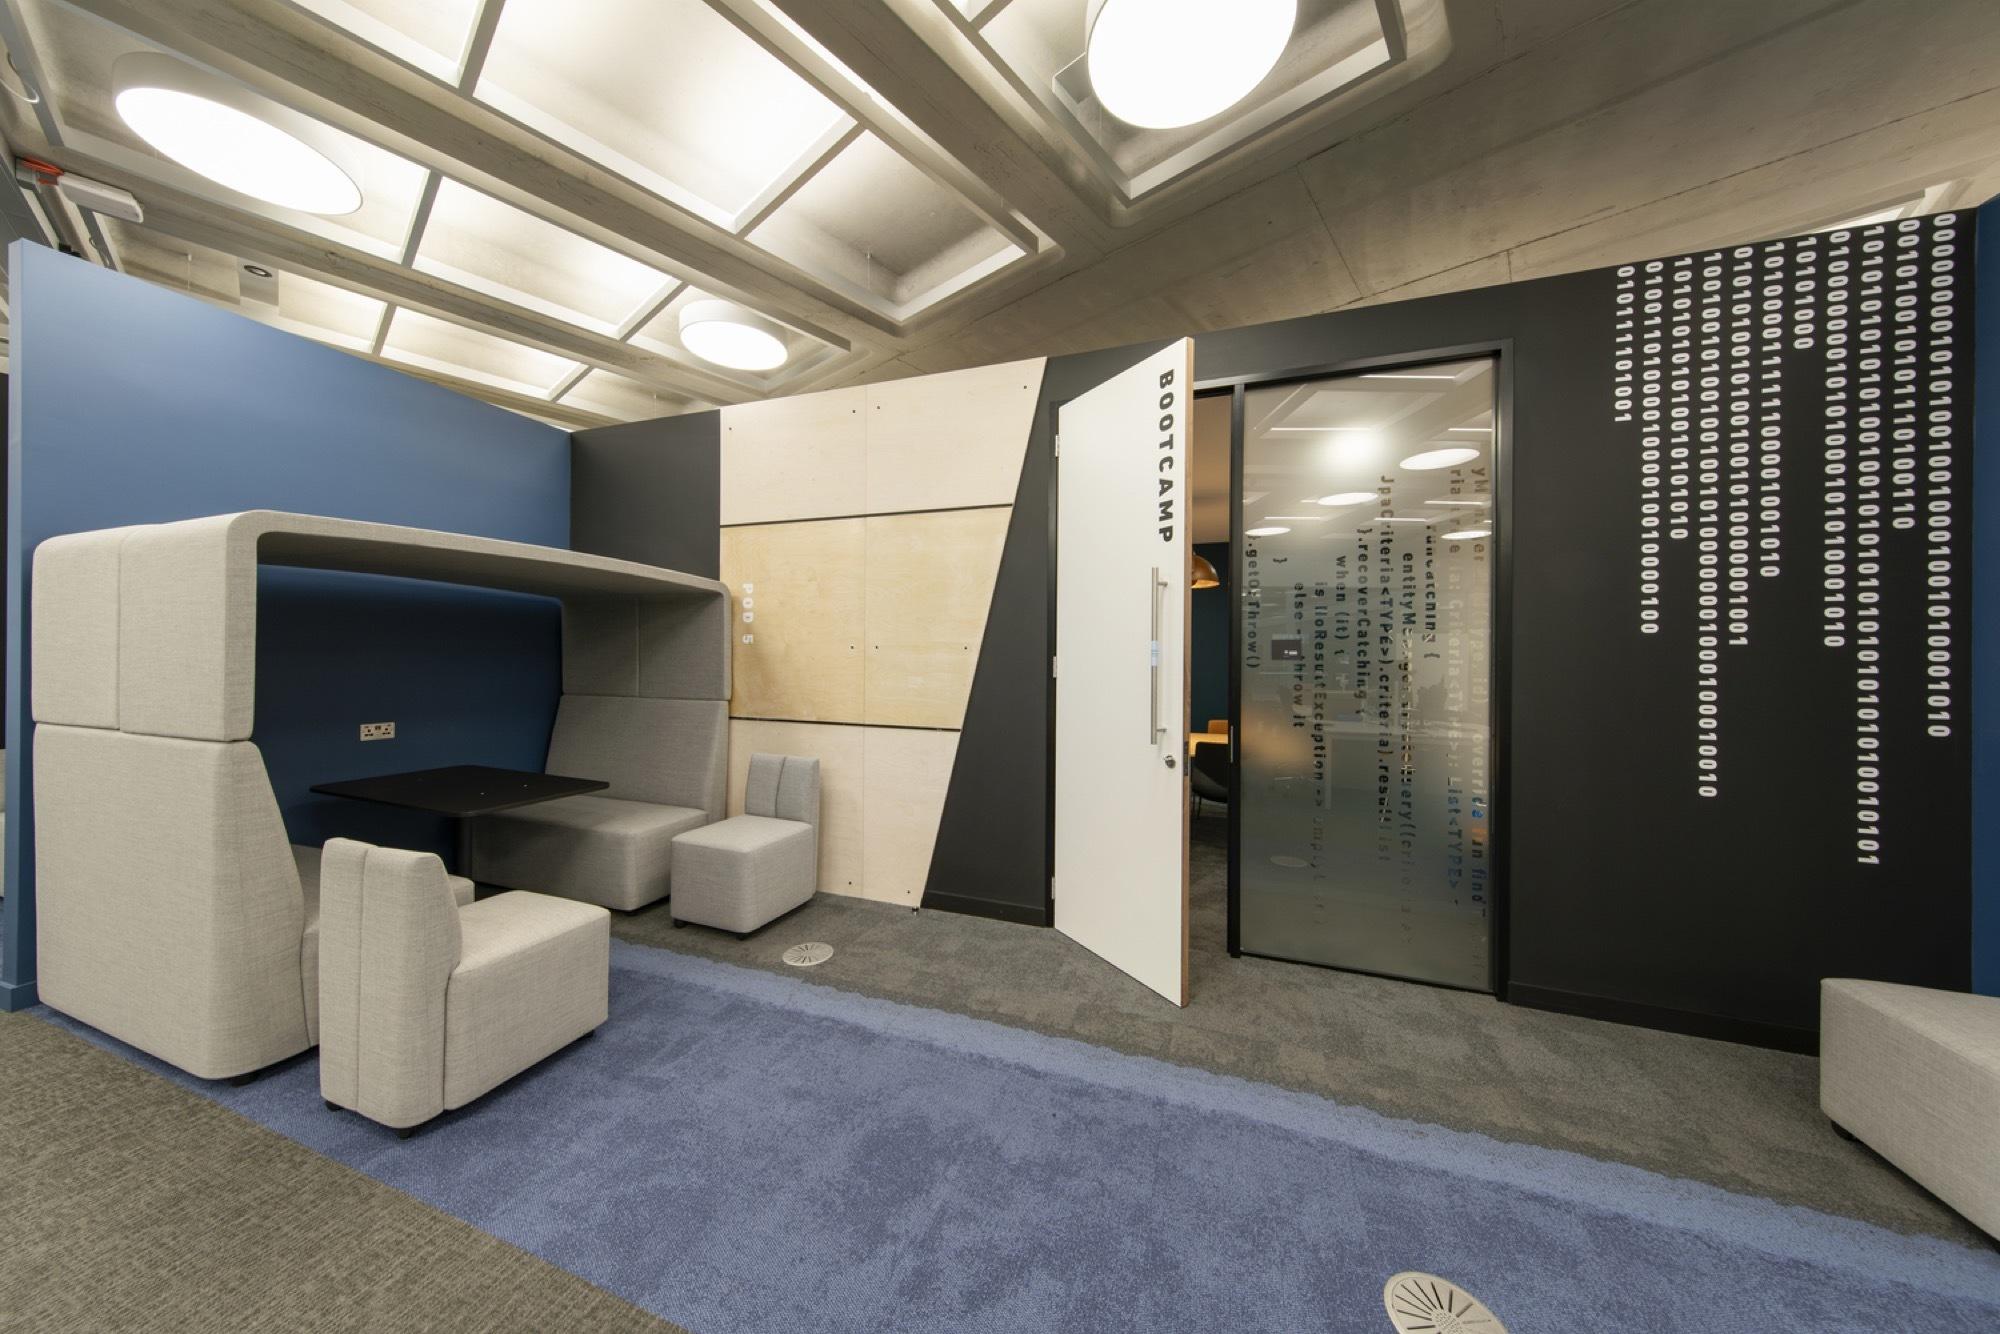 Metapack breakout space design ideas